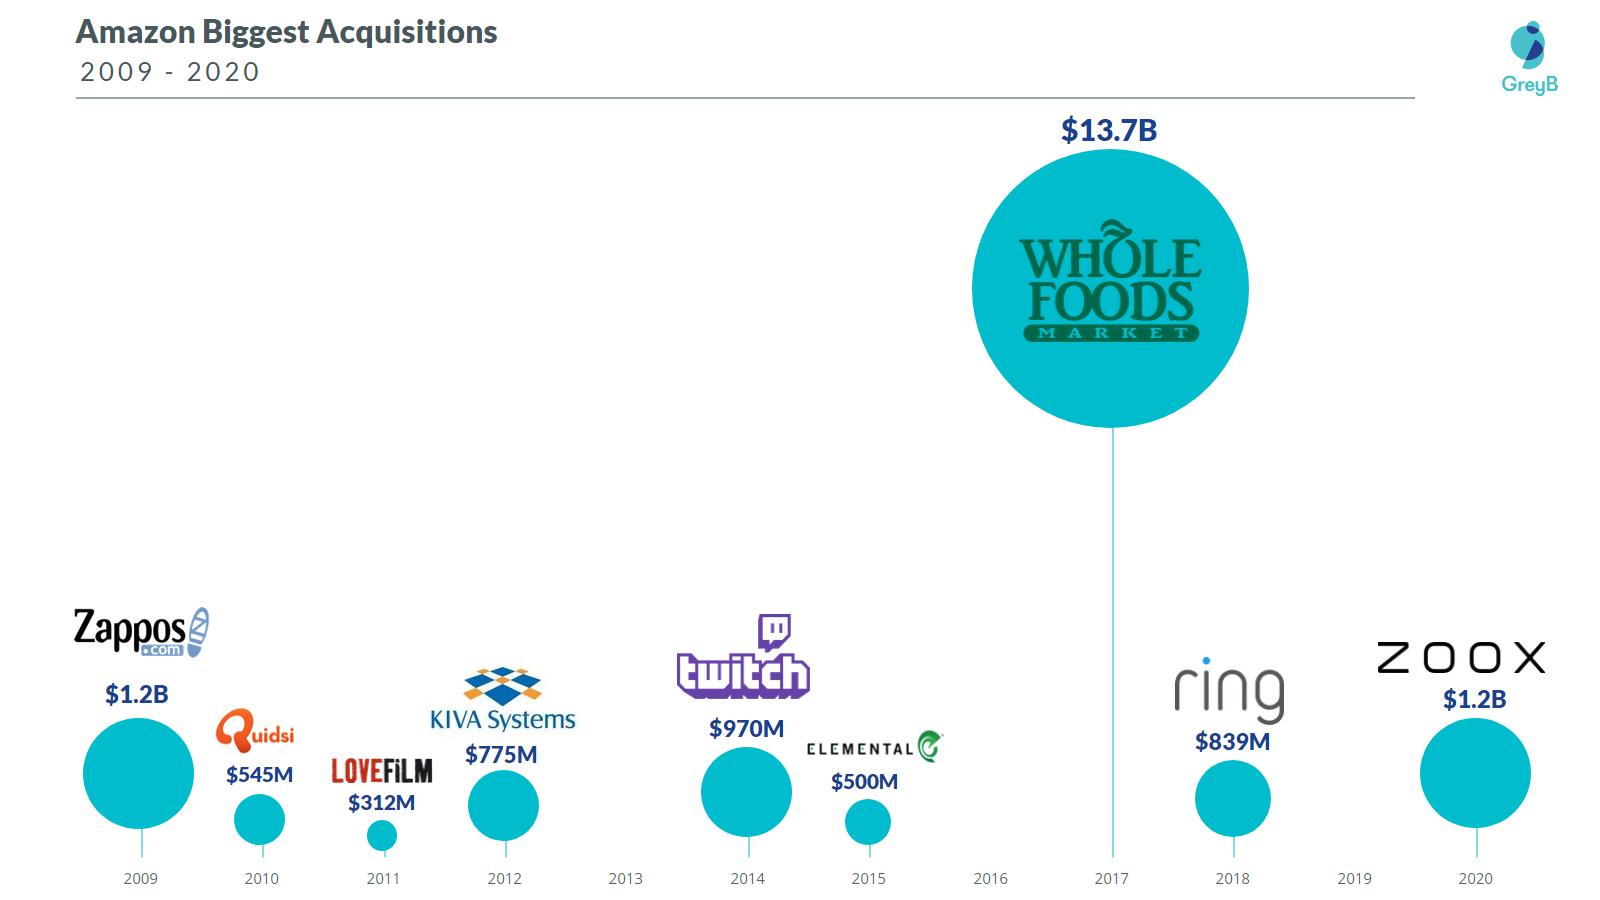 Amazon Biggest Acquisitions